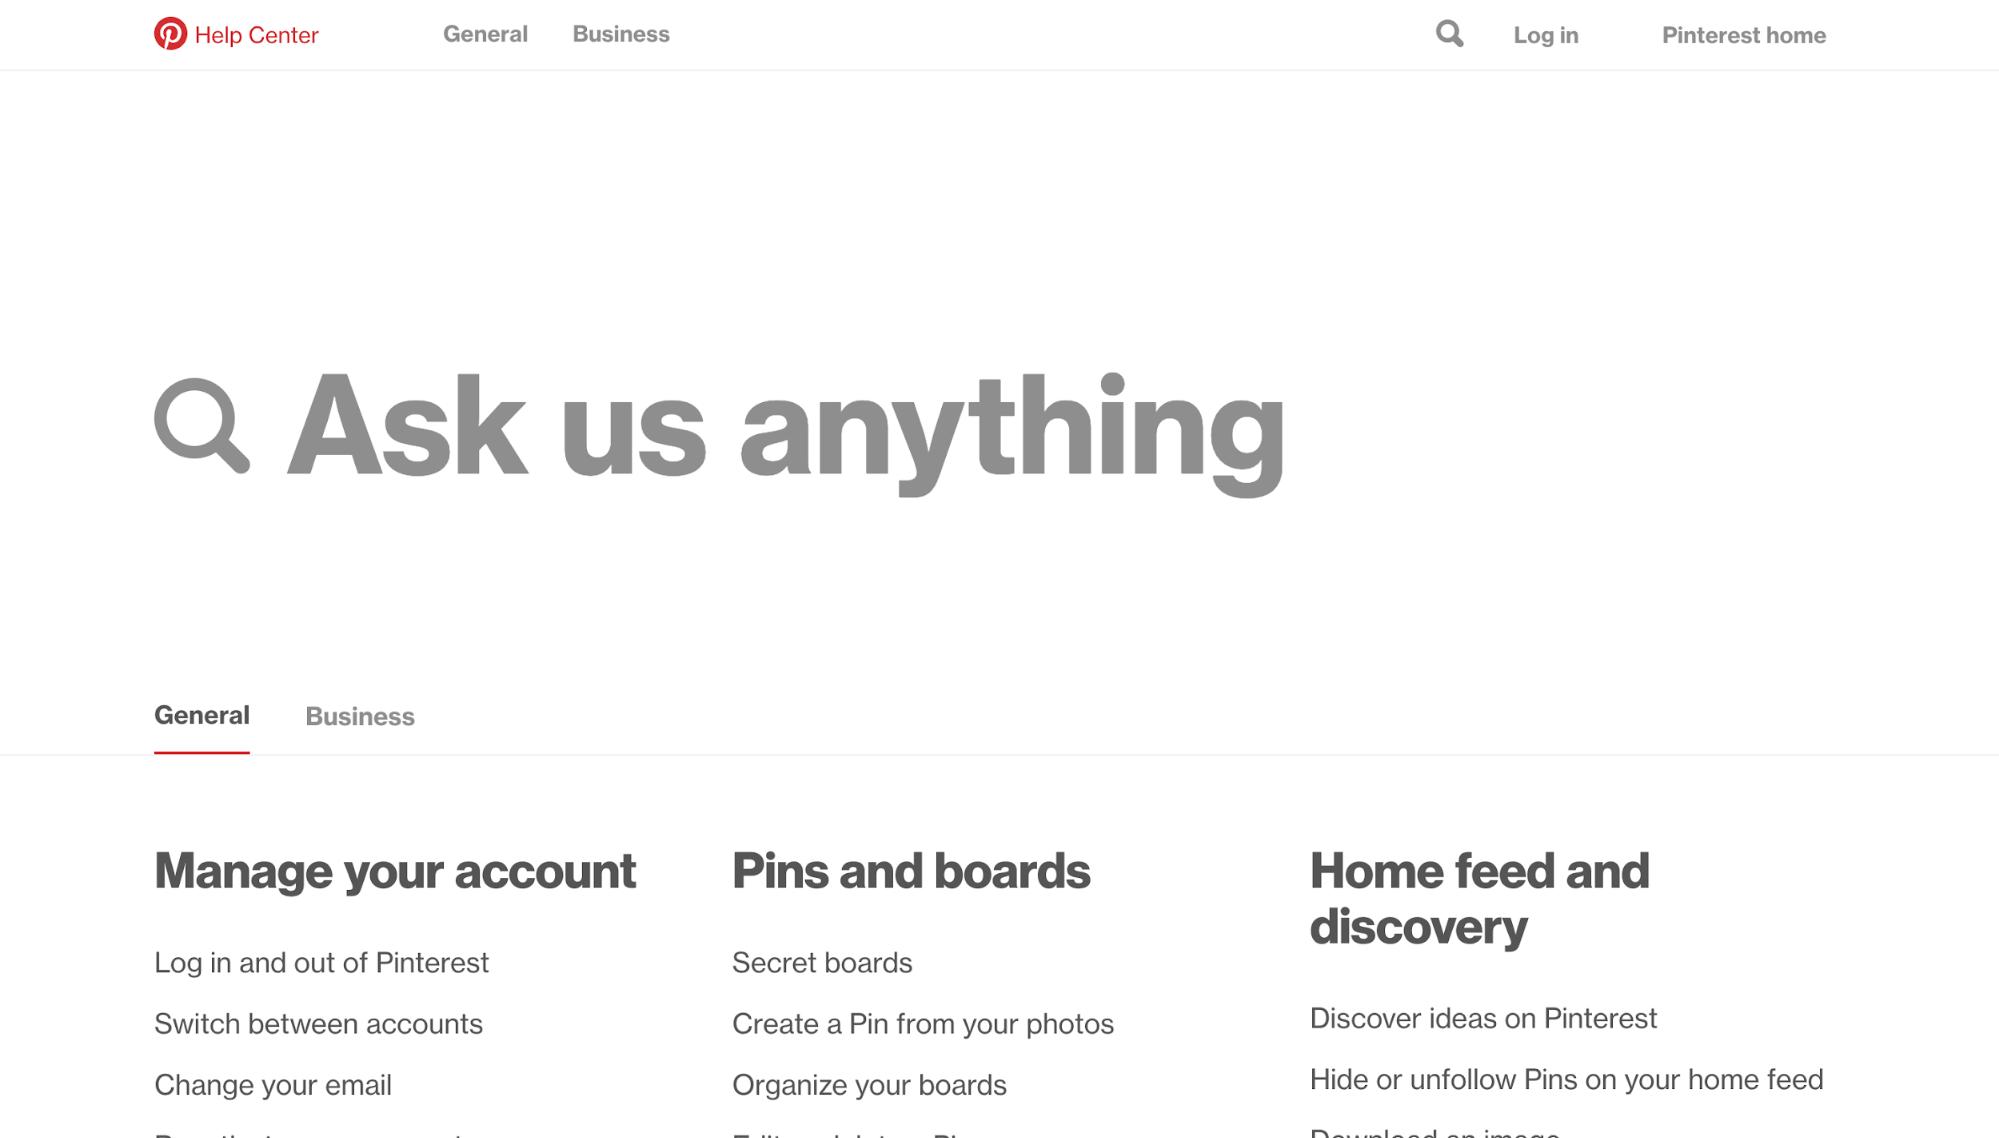 Pinterest FAQ page